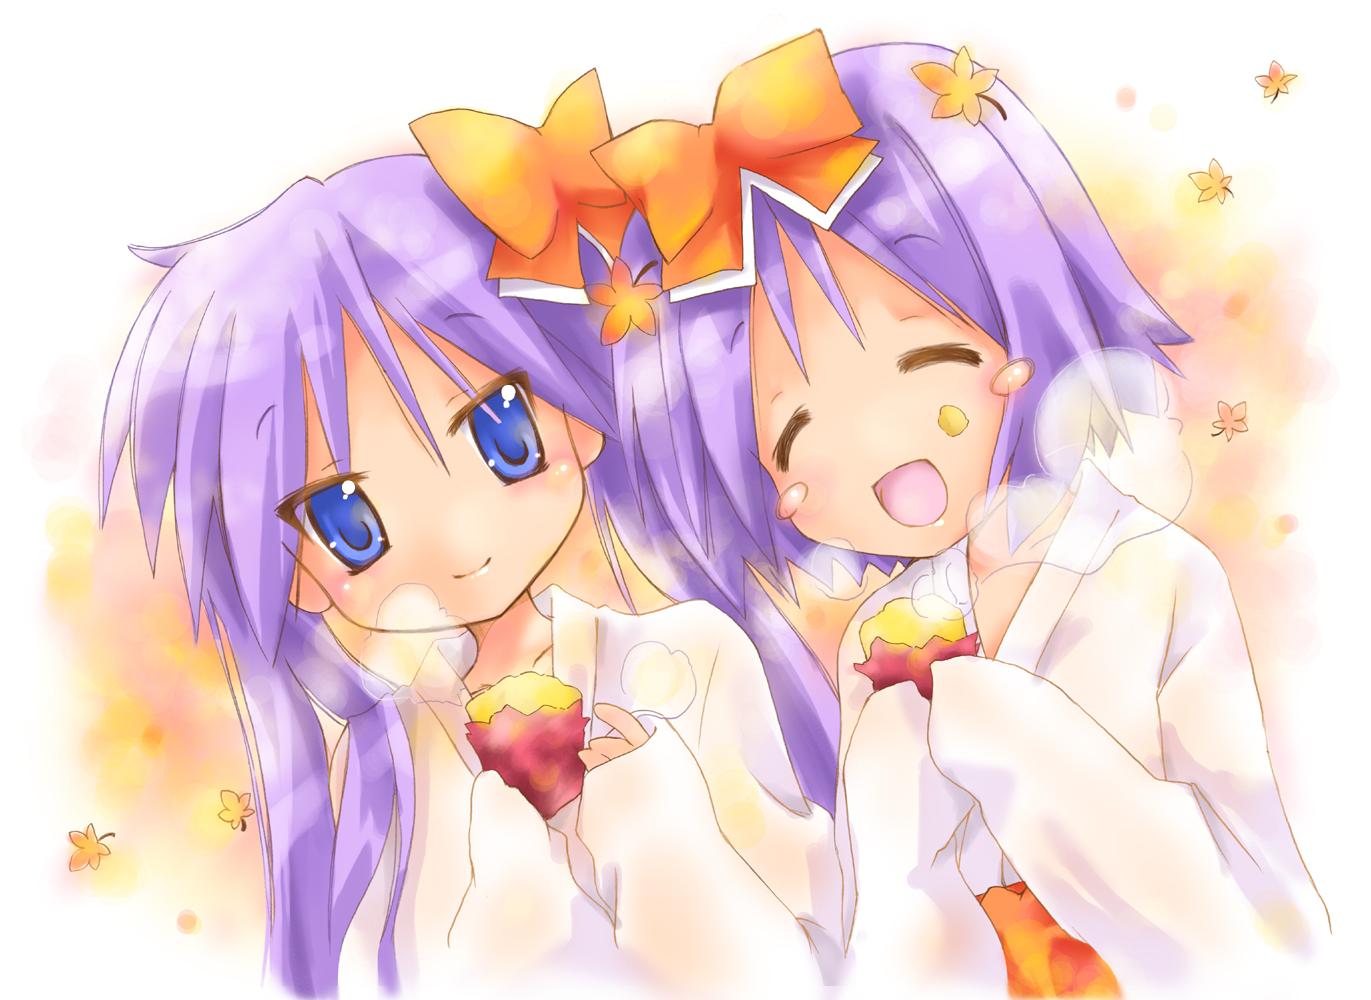 blue_eyes hiiragi_kagami hiiragi_tsukasa japanese_clothes long_hair lucky_star miko nyanmilla purple_hair short_hair twintails